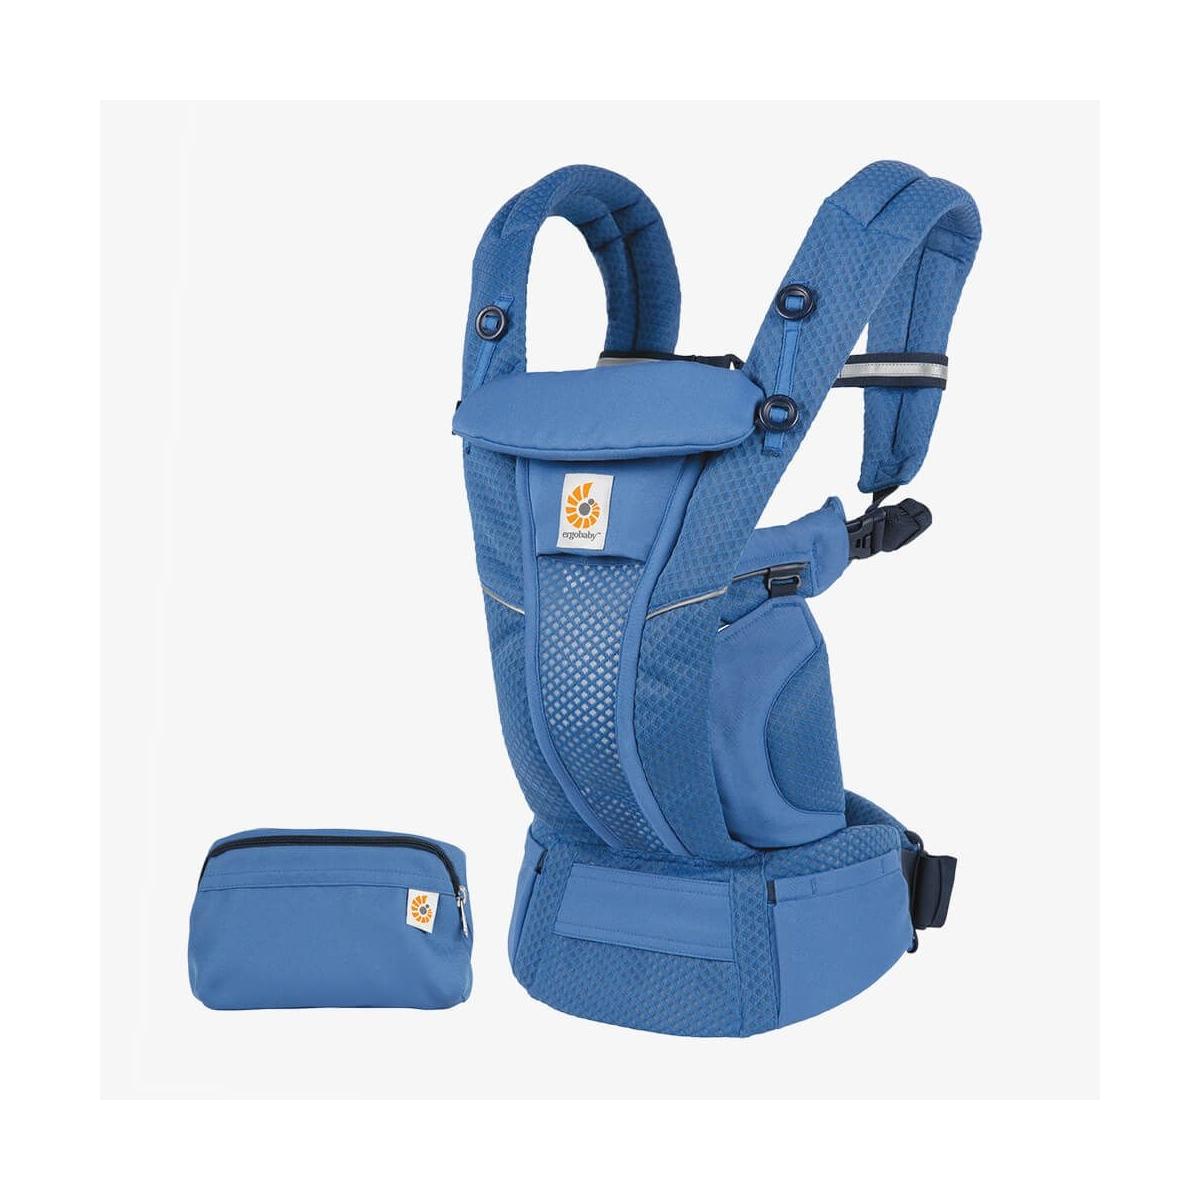 Ergobaby Omni Breeze Baby Carrier-Sapphire Blue (2021)